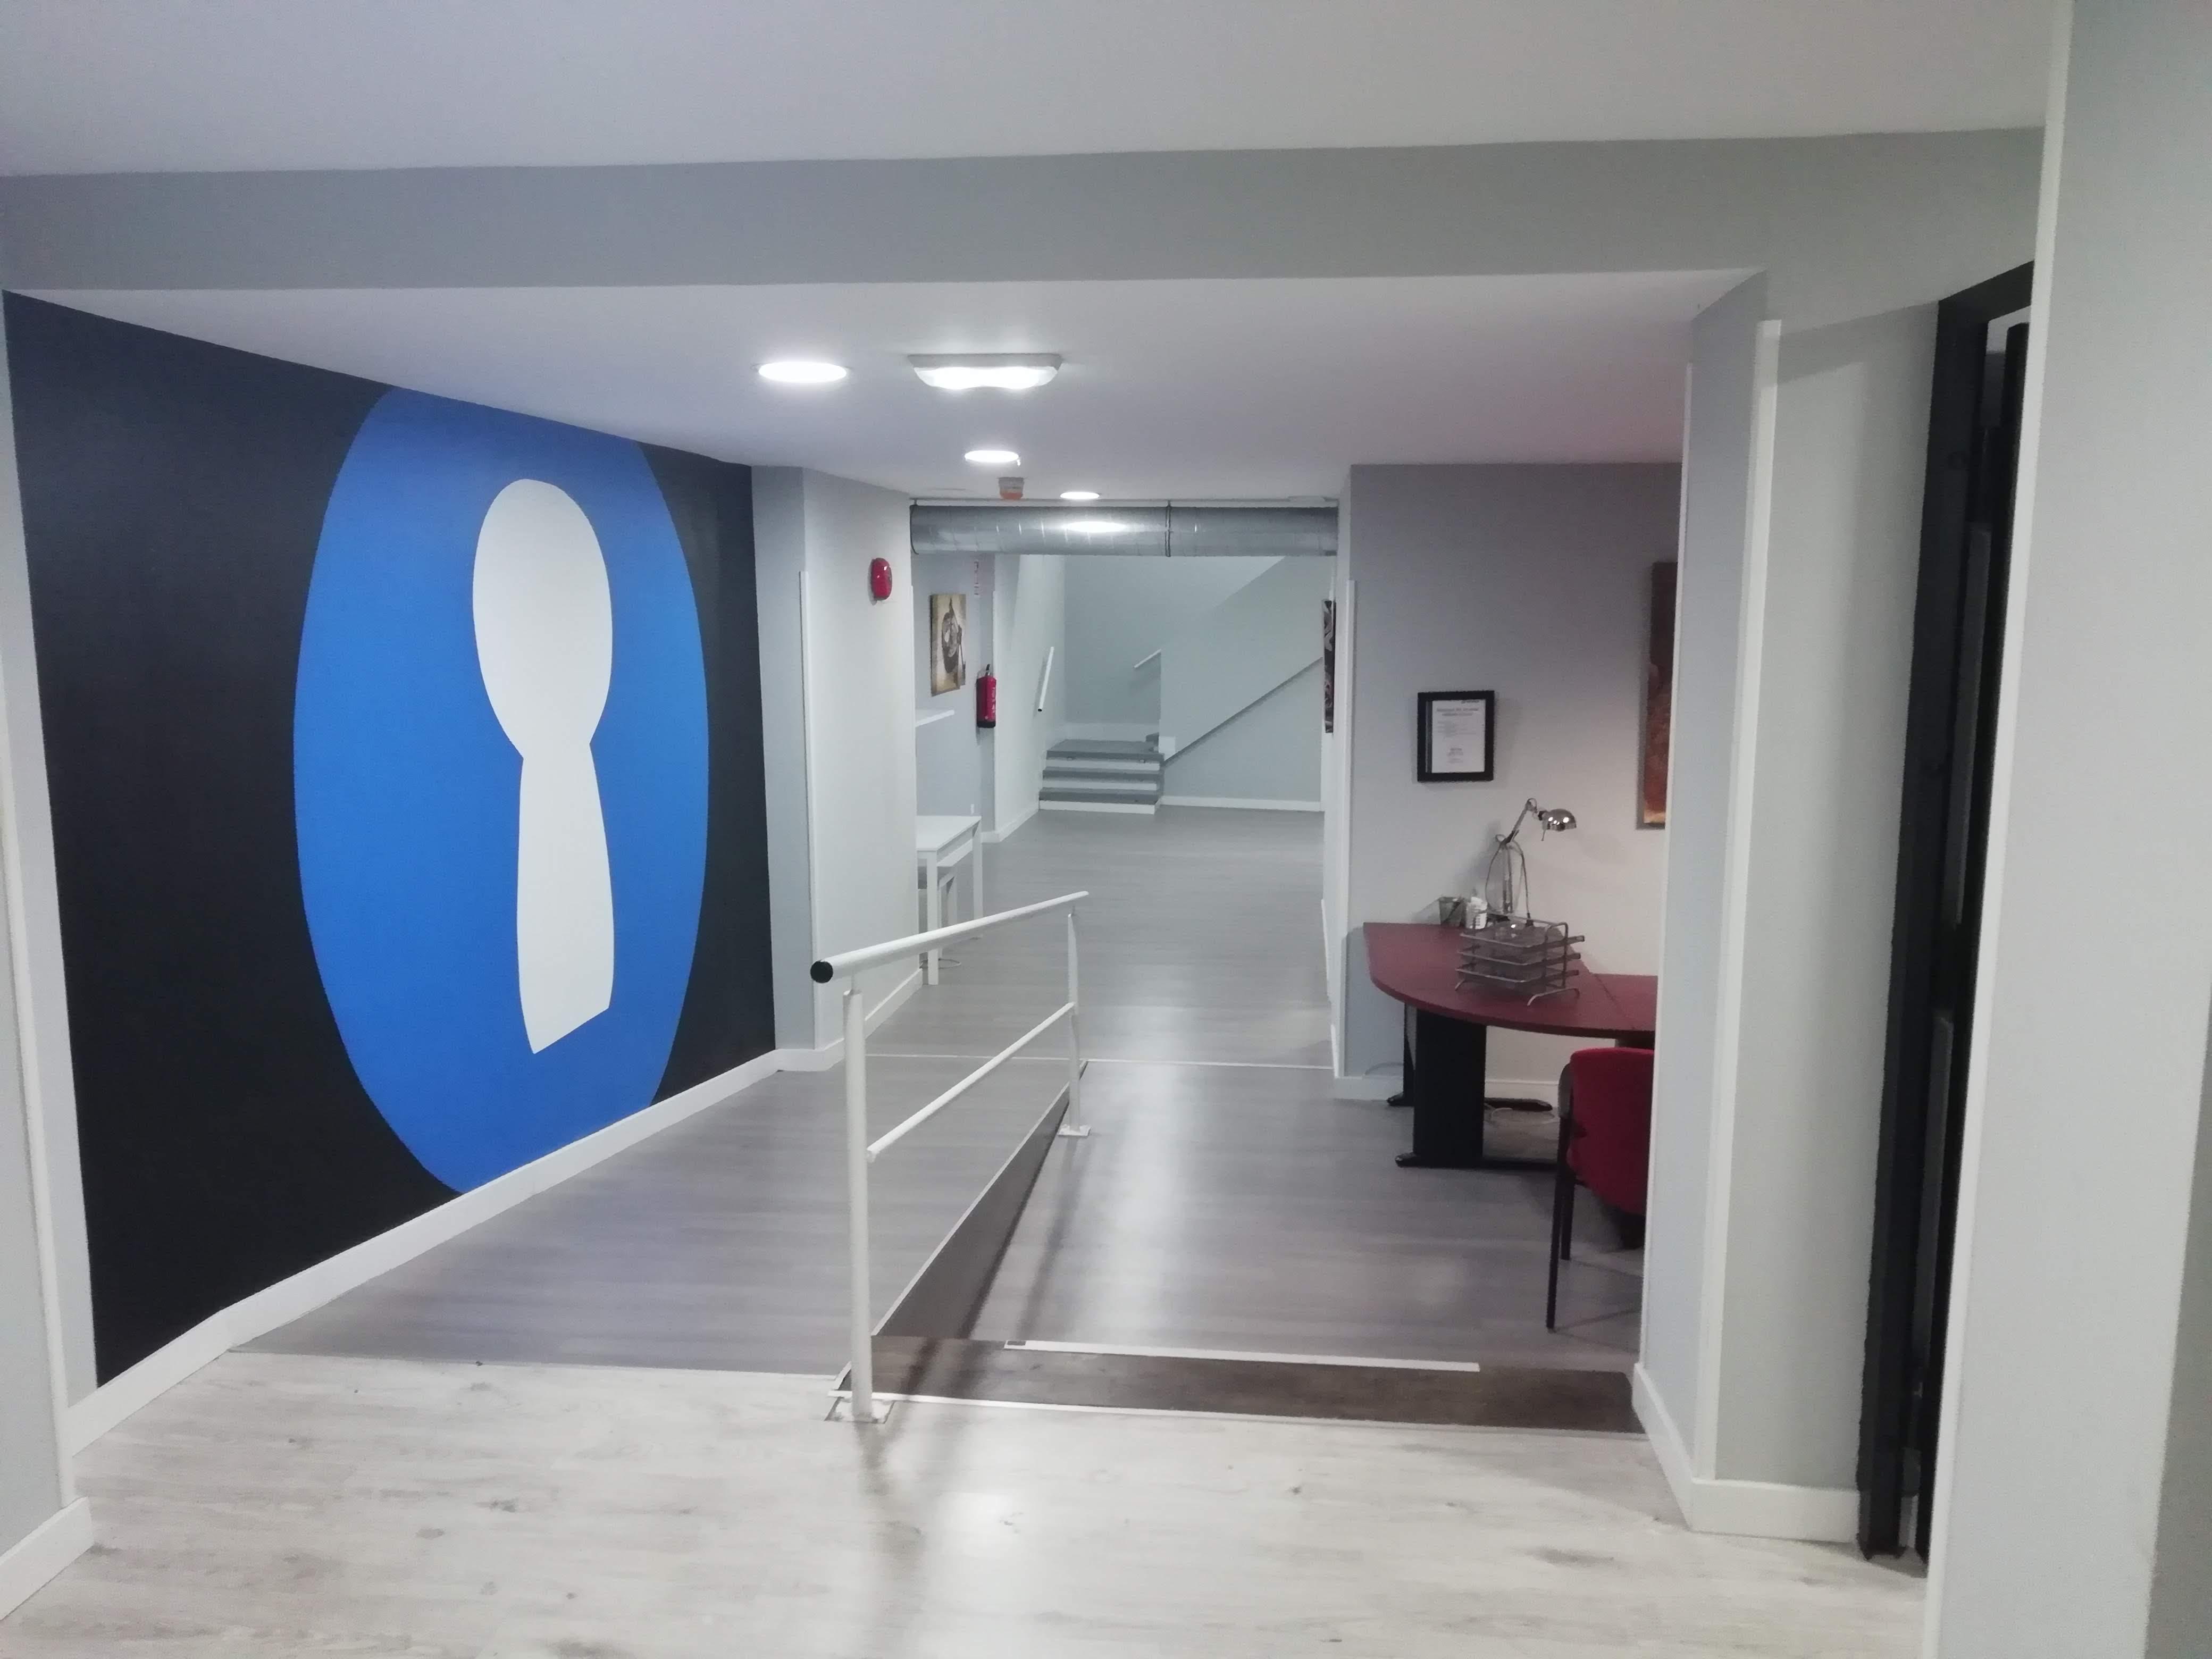 Alquiler de local/oficina en Foncalada, Oviedo.